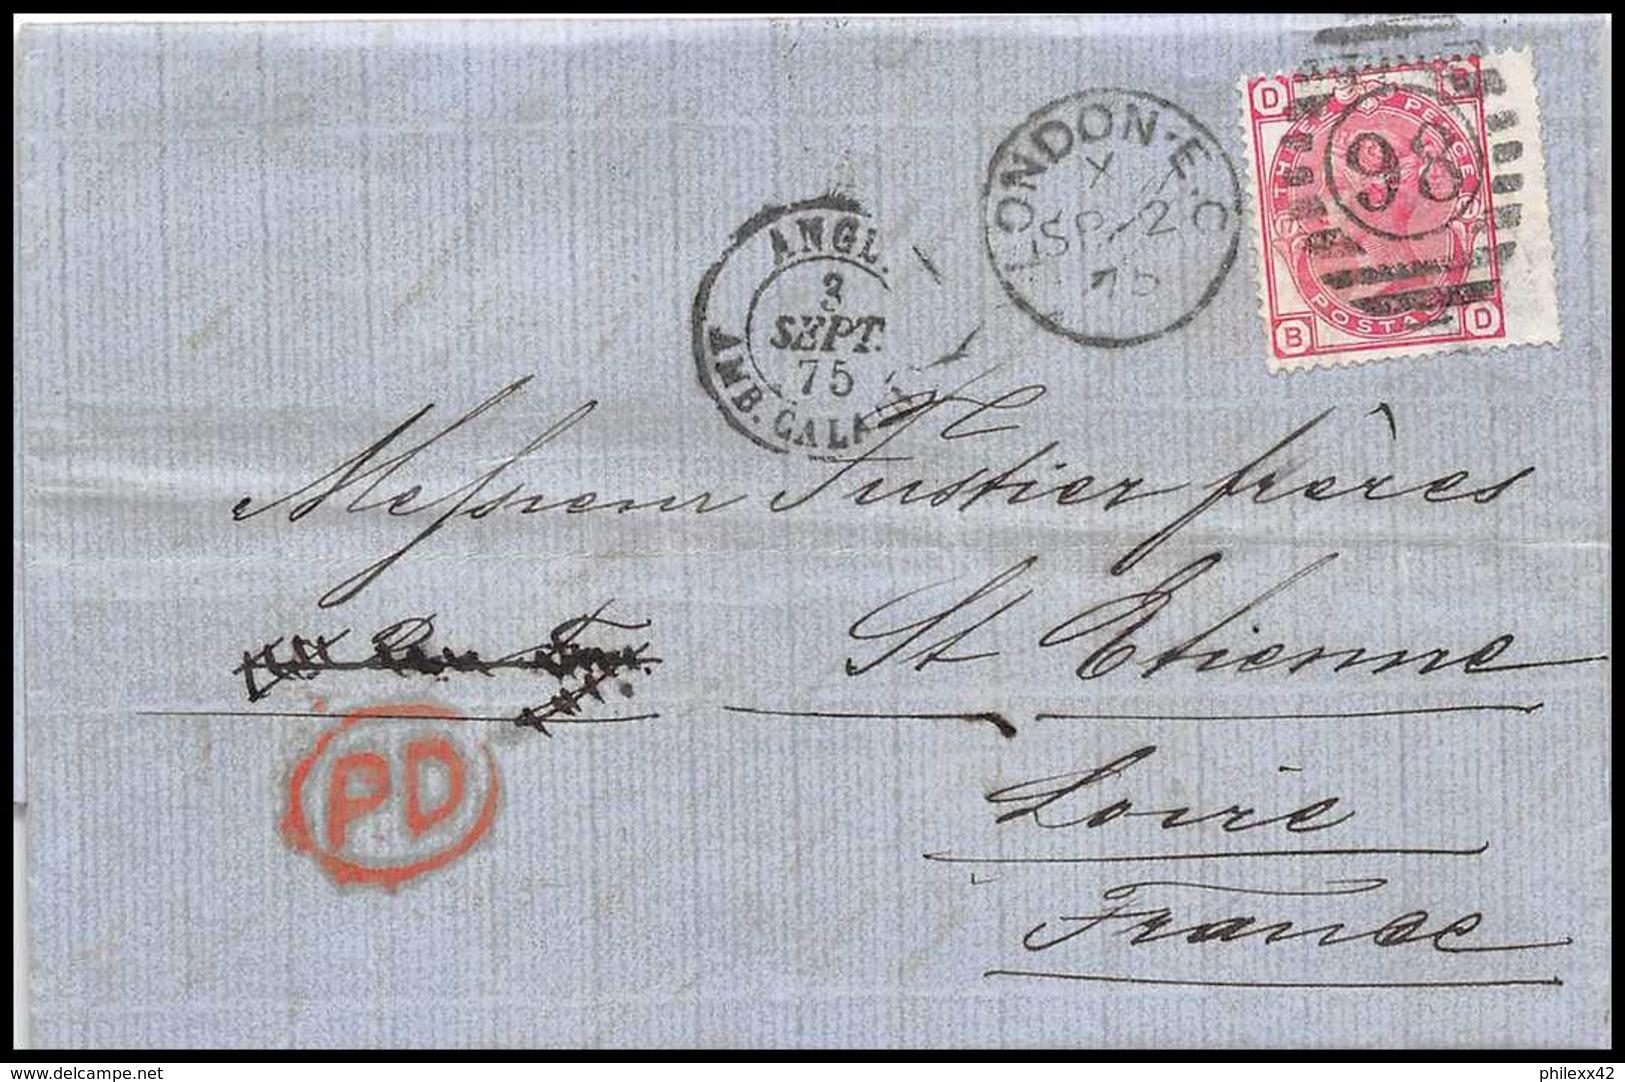 35404 N°51 Victoria 3p Pink London St Etienne France 1875 Cachet 98 Lettre Cover Grande Bretagne Great Britain - 1840-1901 (Victoria)